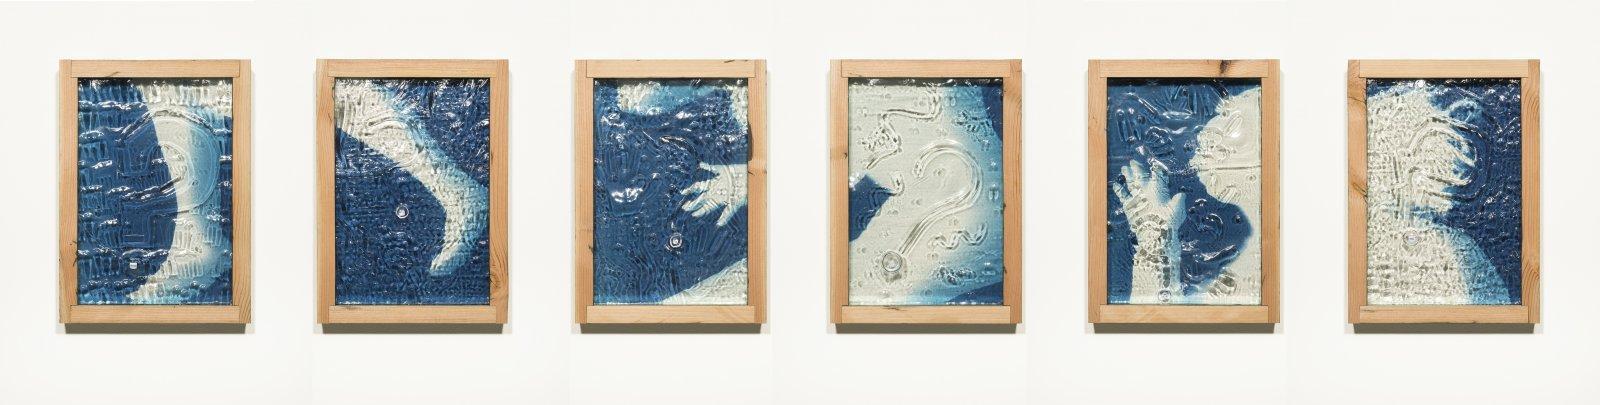 Julia Feyrer, The Pedestrians: Left Head, Right Head, Left Body, Right Body, Left Foot, Right Foot, 2014, 6 cyanotypes, dice, aged fir, mirror inlay, each 22 x 16 x 3 inches (56 x 41 x 8 cm)